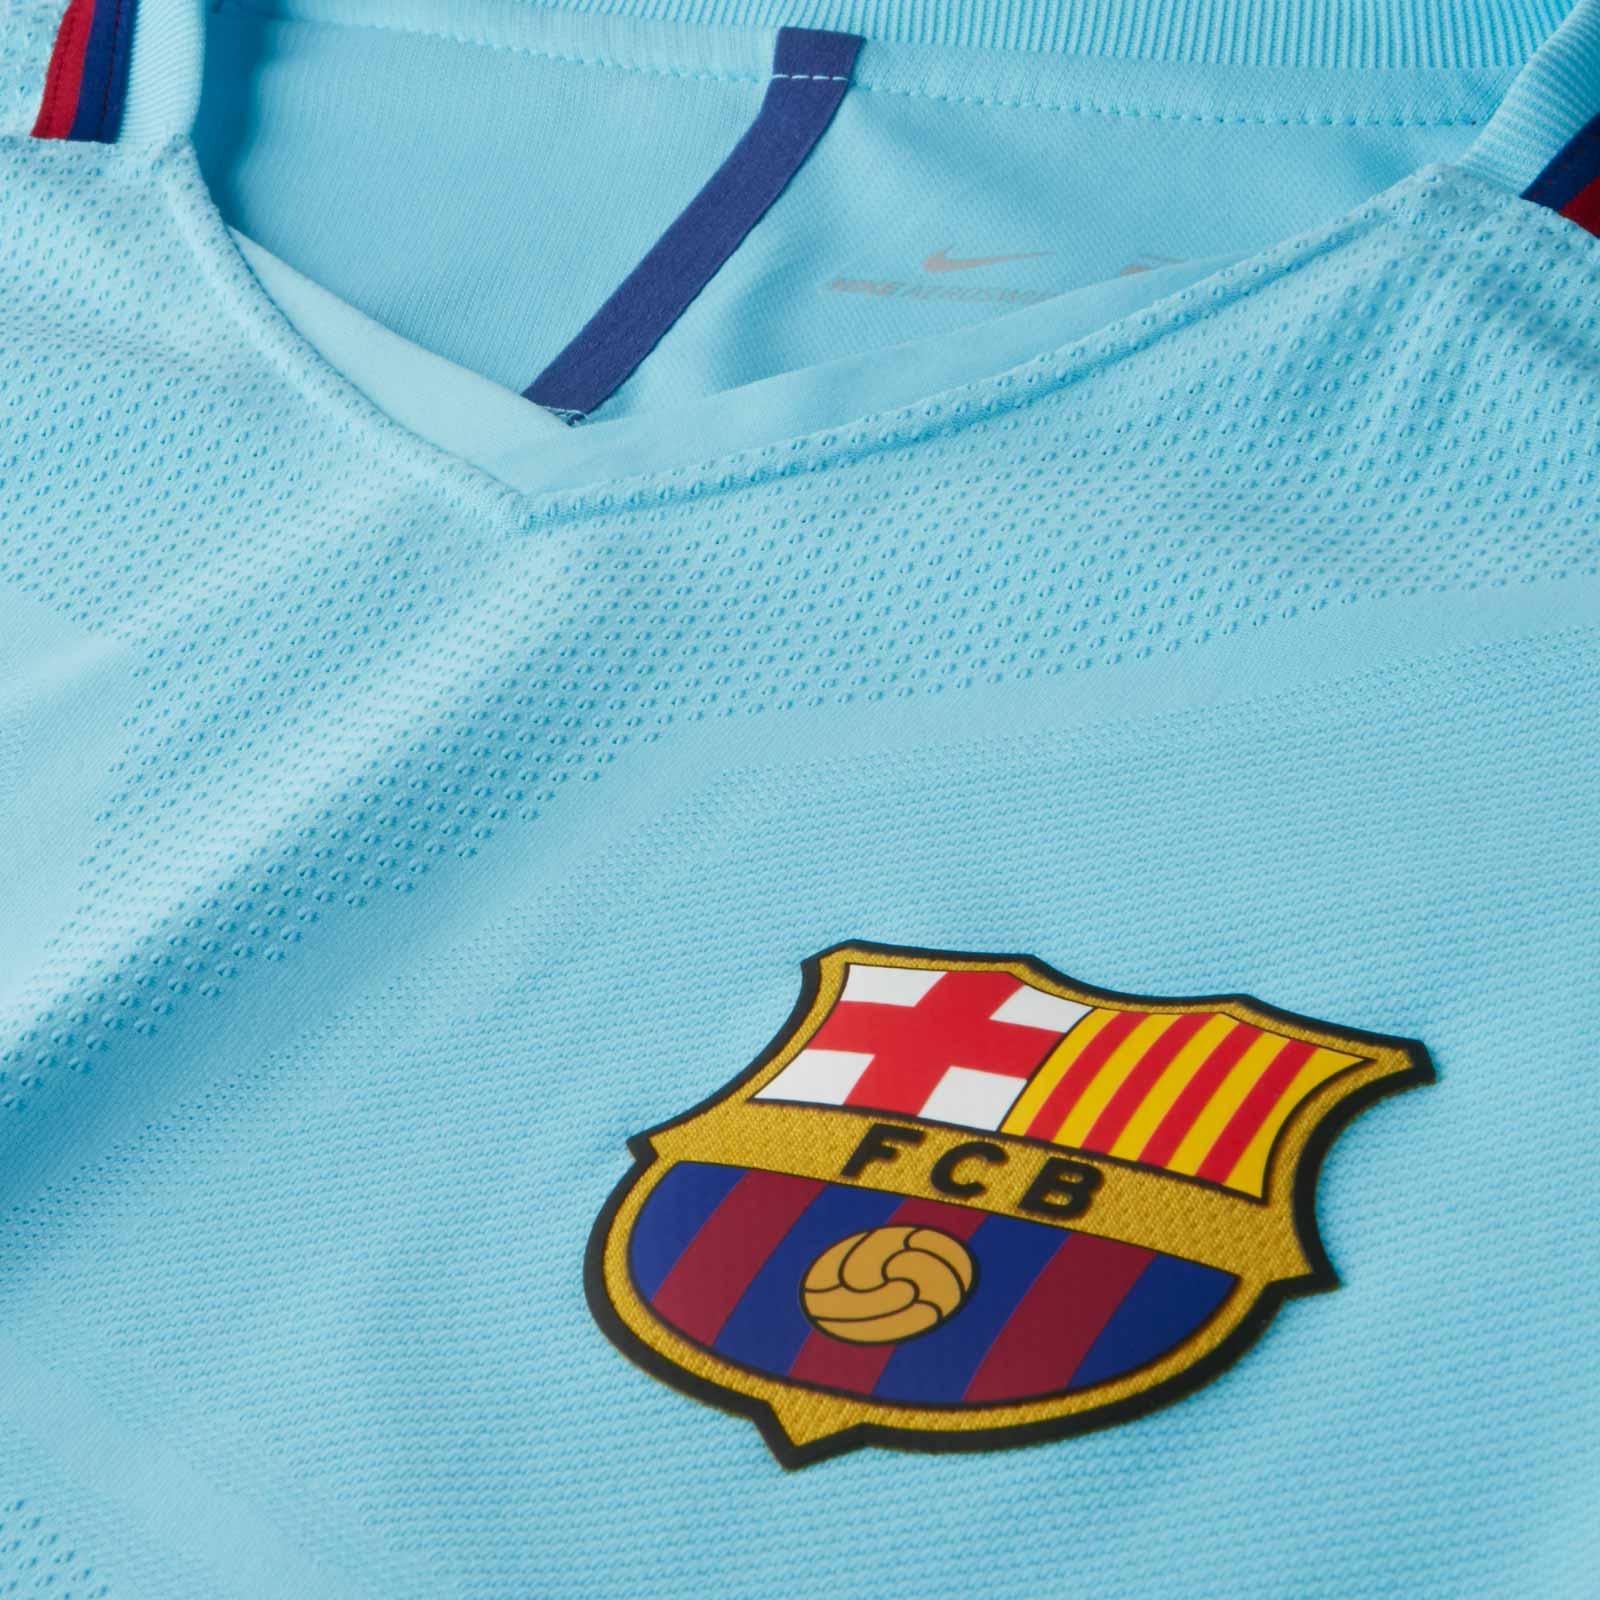 camiseta suplente fc barcelona 17 18